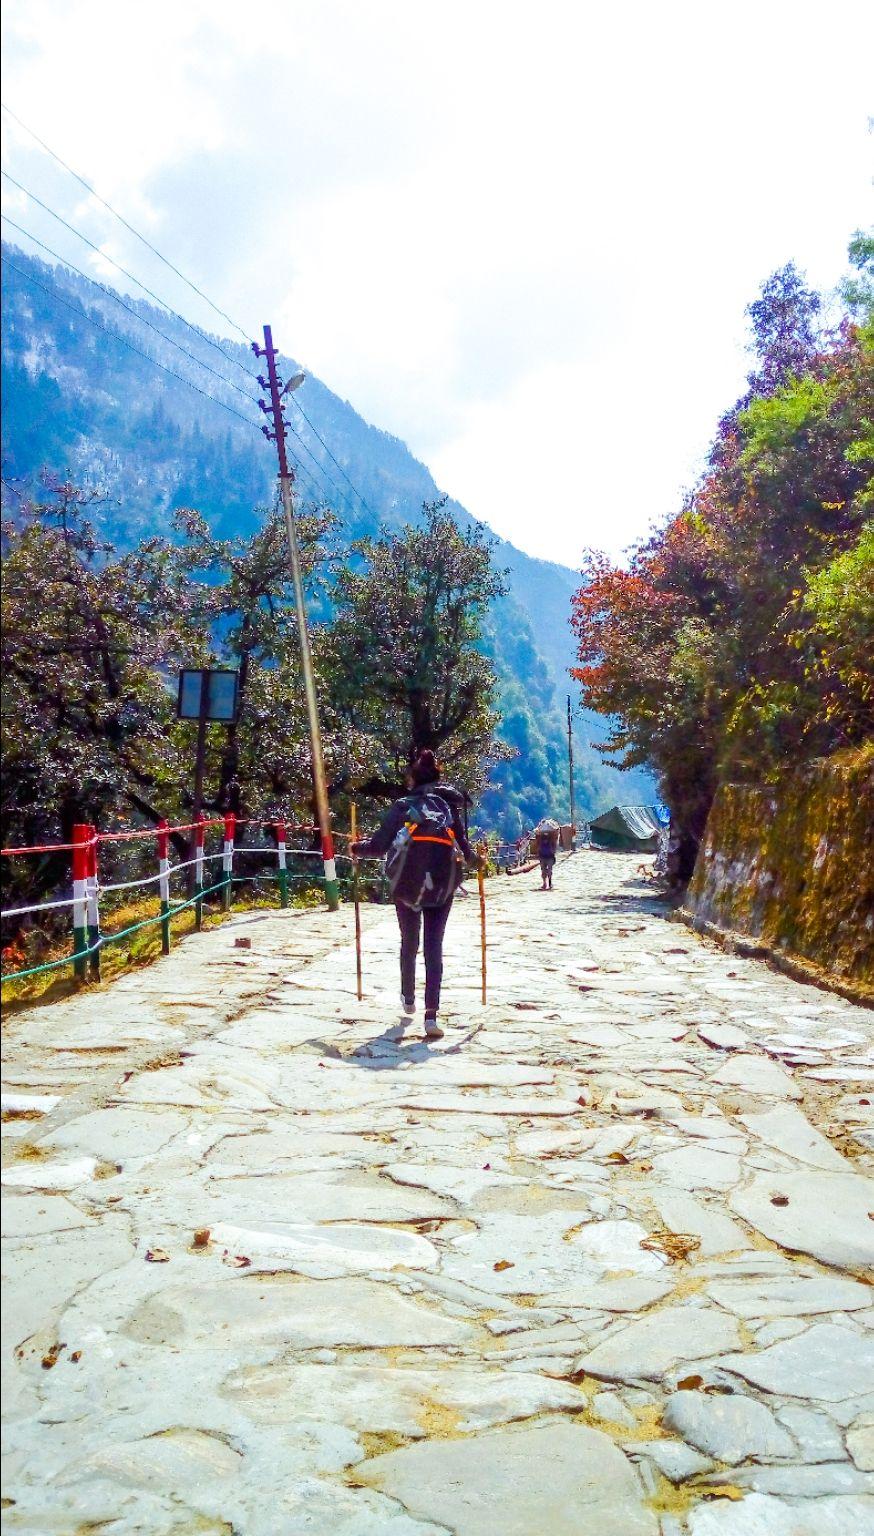 Photo of Gauri Kund - Kedarnath Trekking Way By bhawna sain